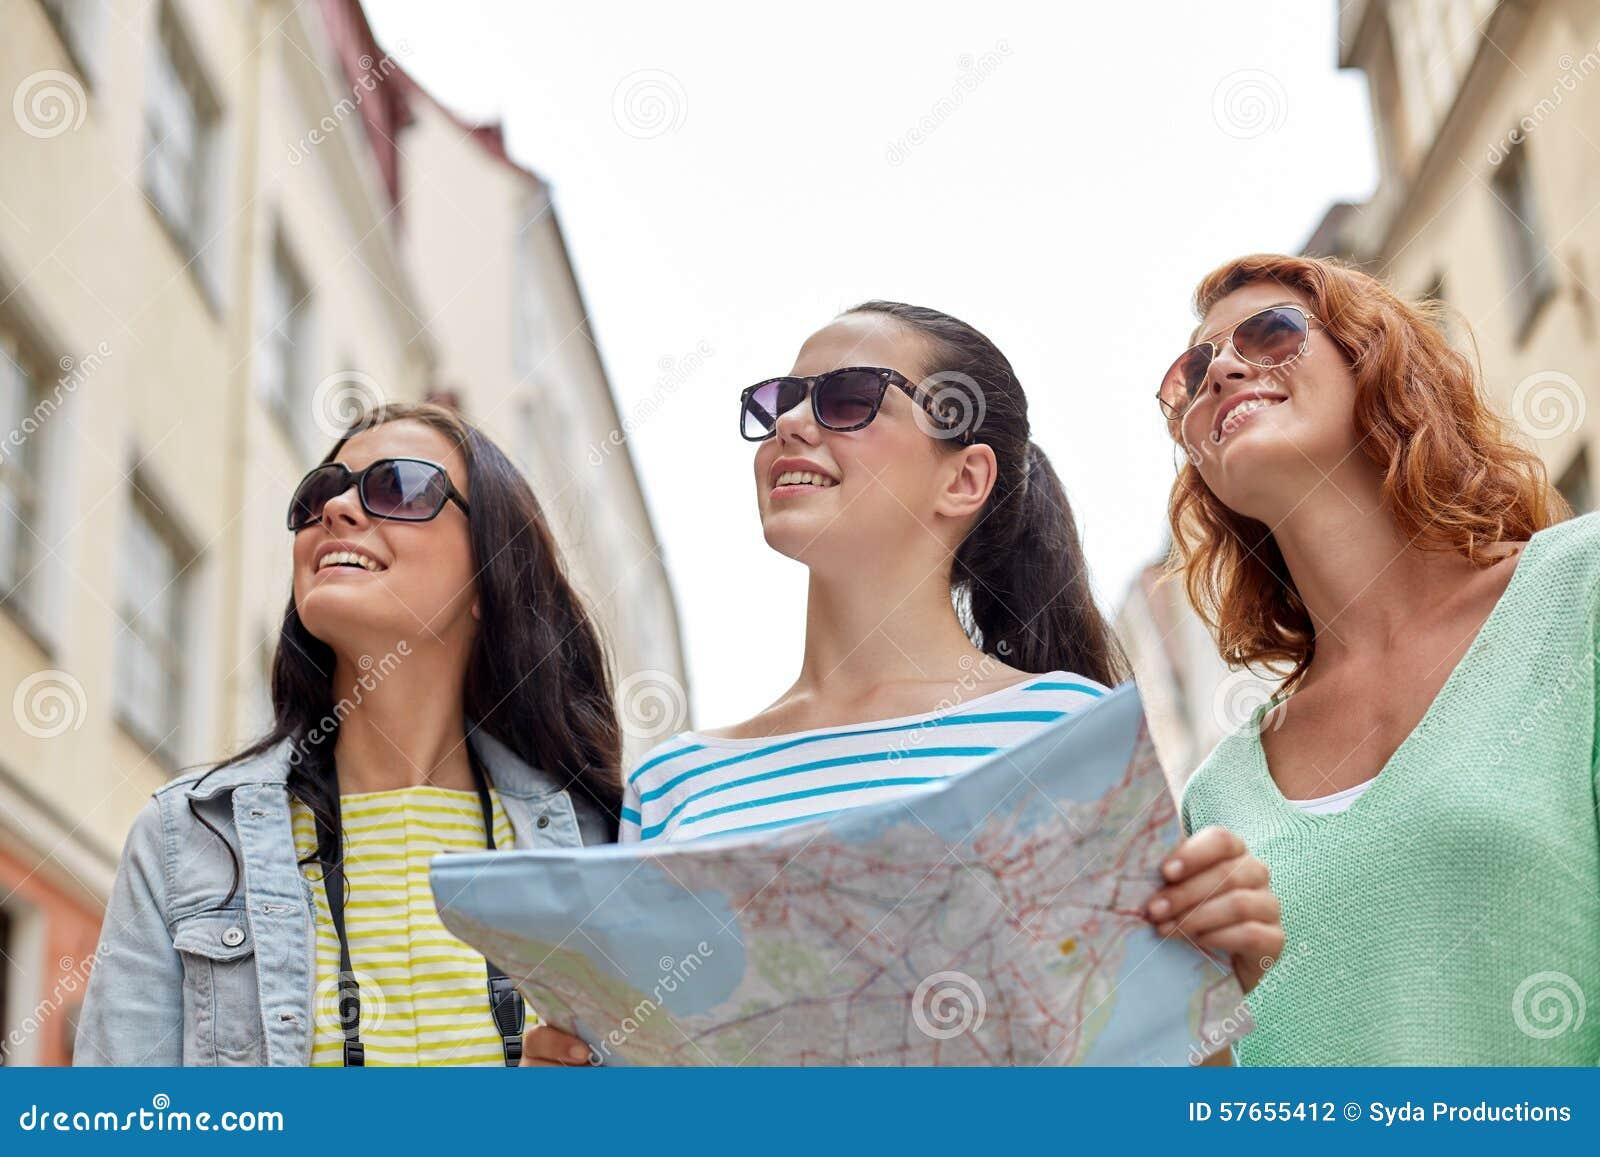 Glimlachende tieners met kaart en camera in openlucht